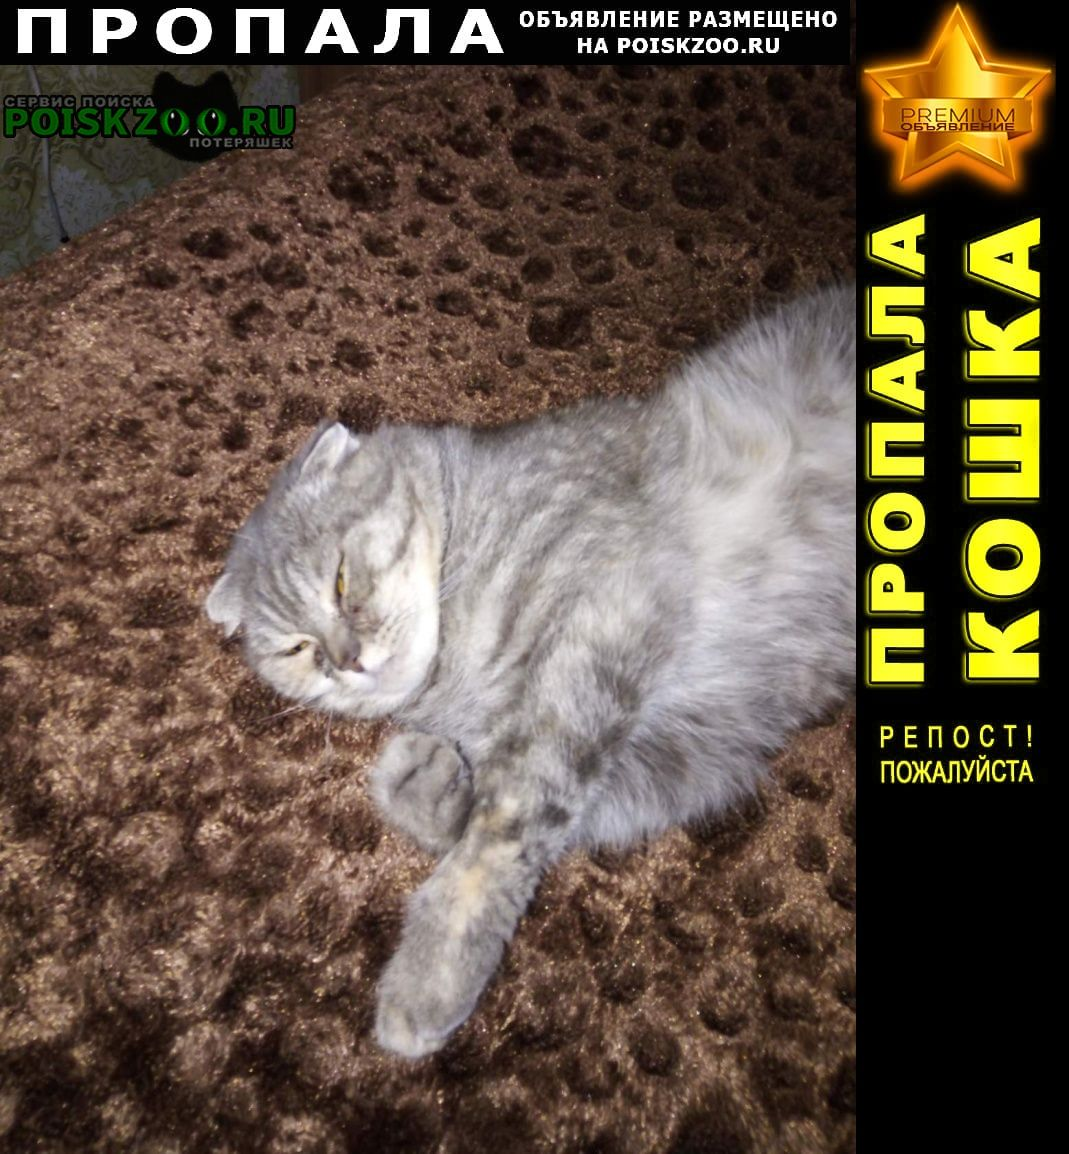 Пропала кошка Серпухов